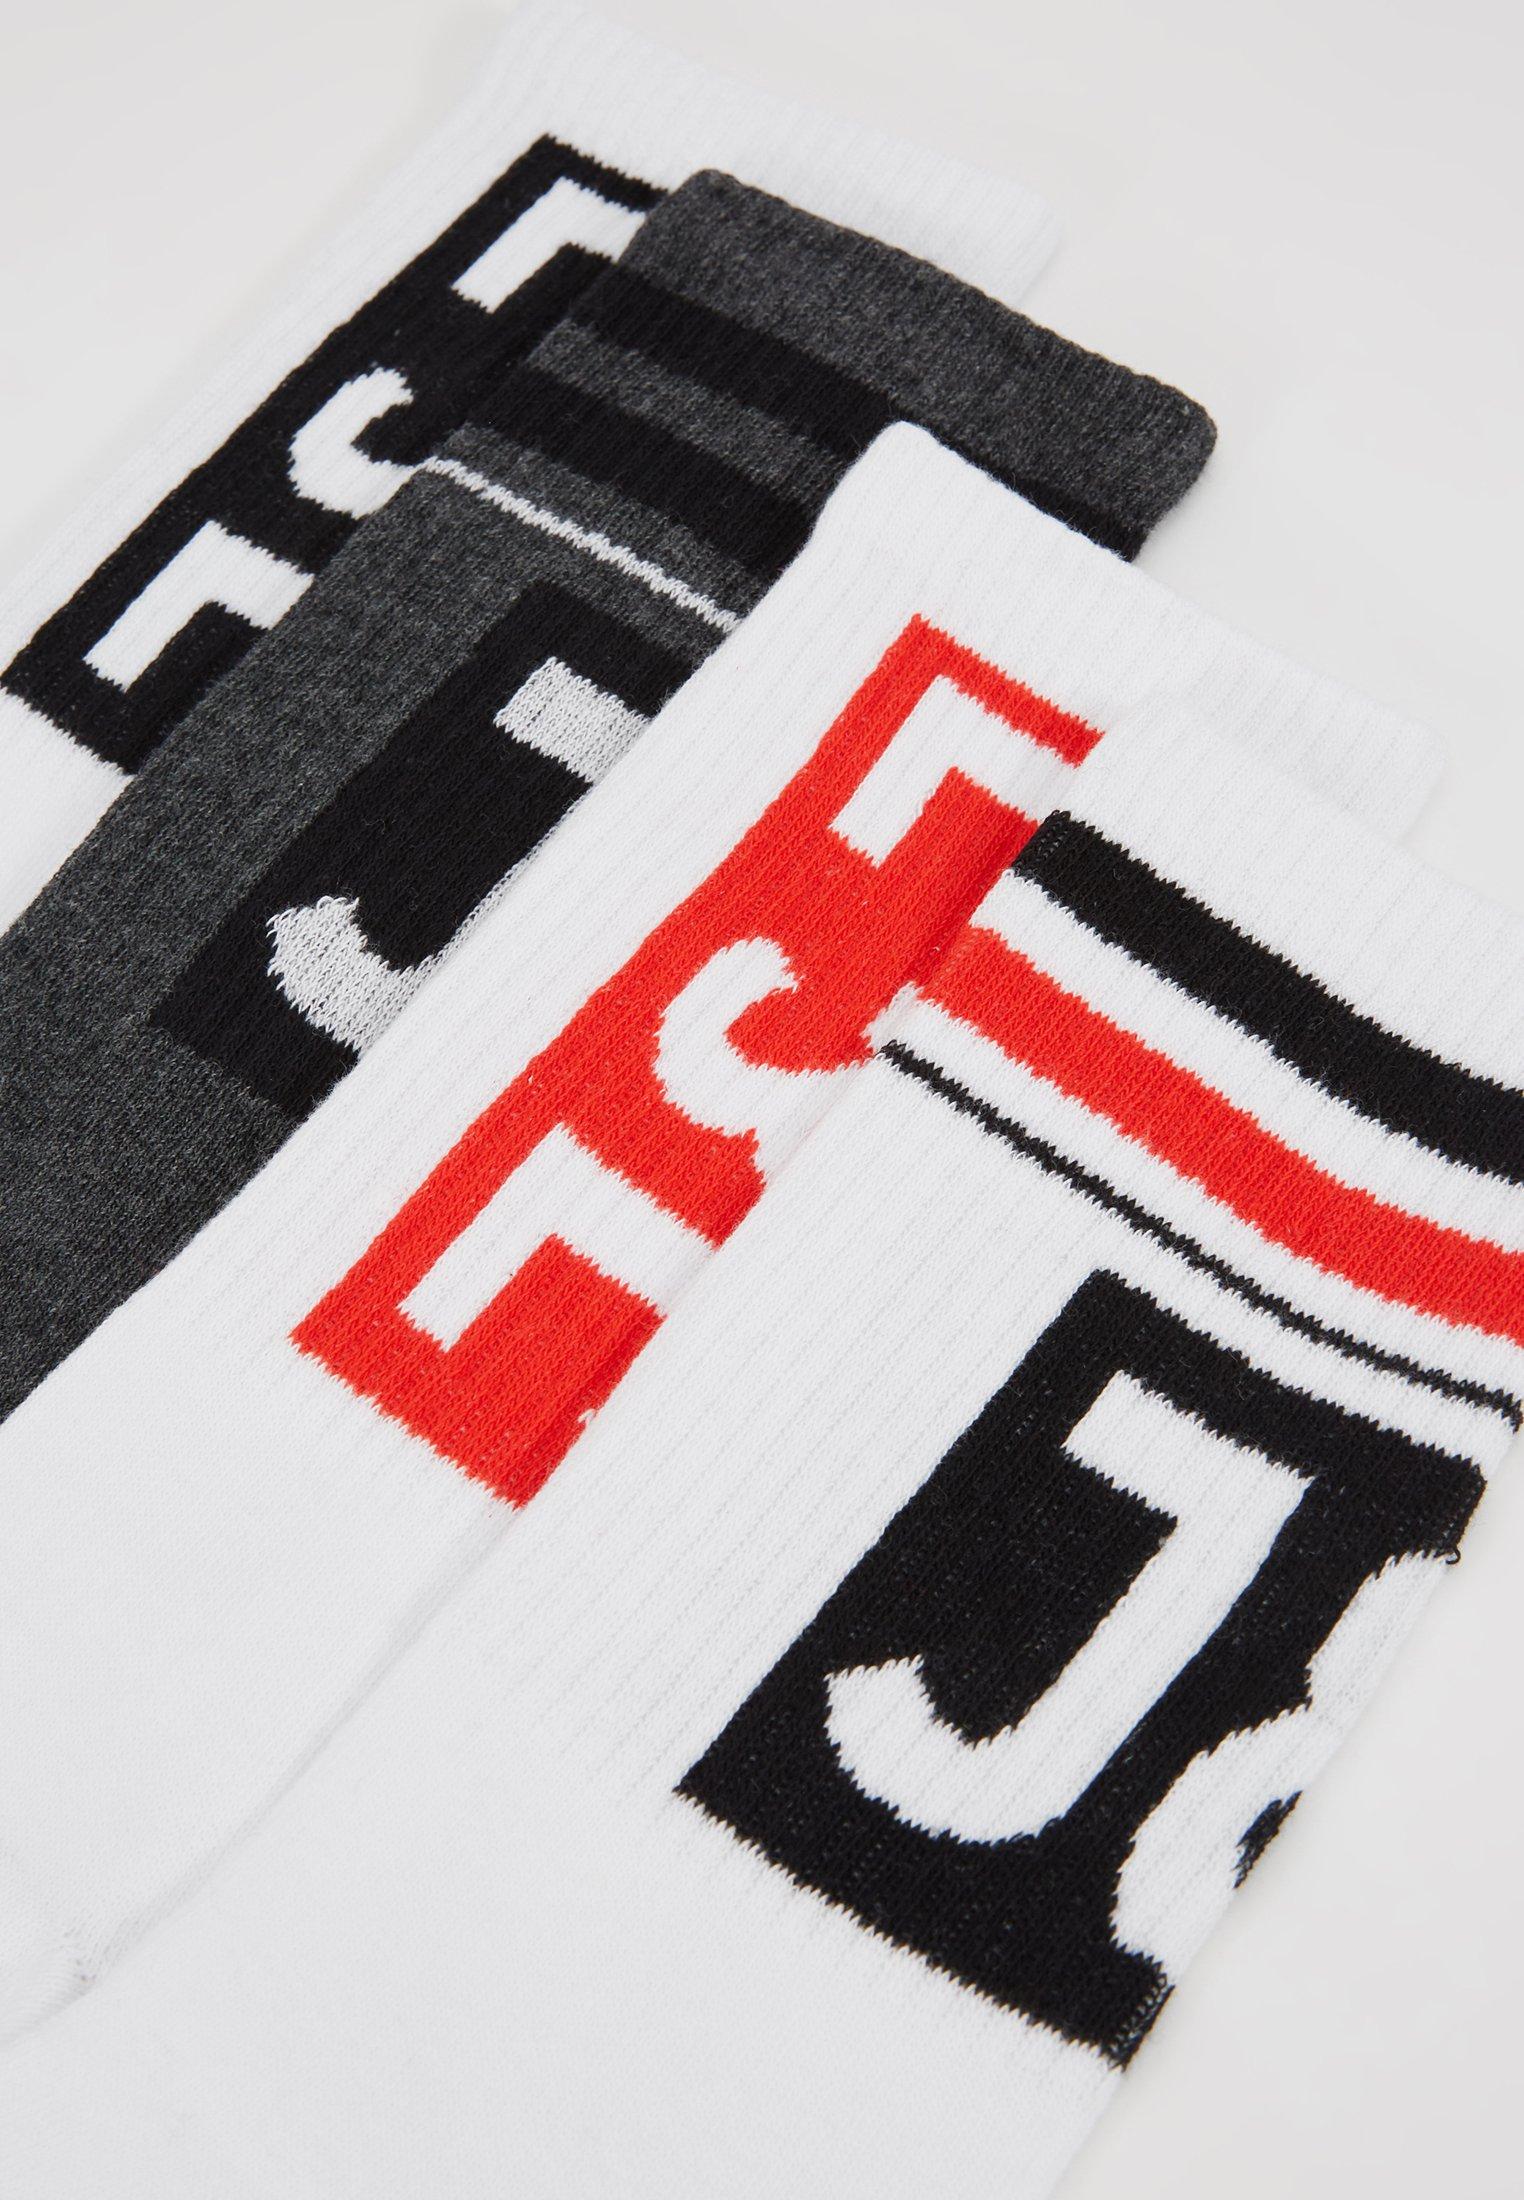 Dark Red white fiery Tennis Grey black PackChaussettes Logo Melange Jackamp; Jones Block 4 bf6Y7gy